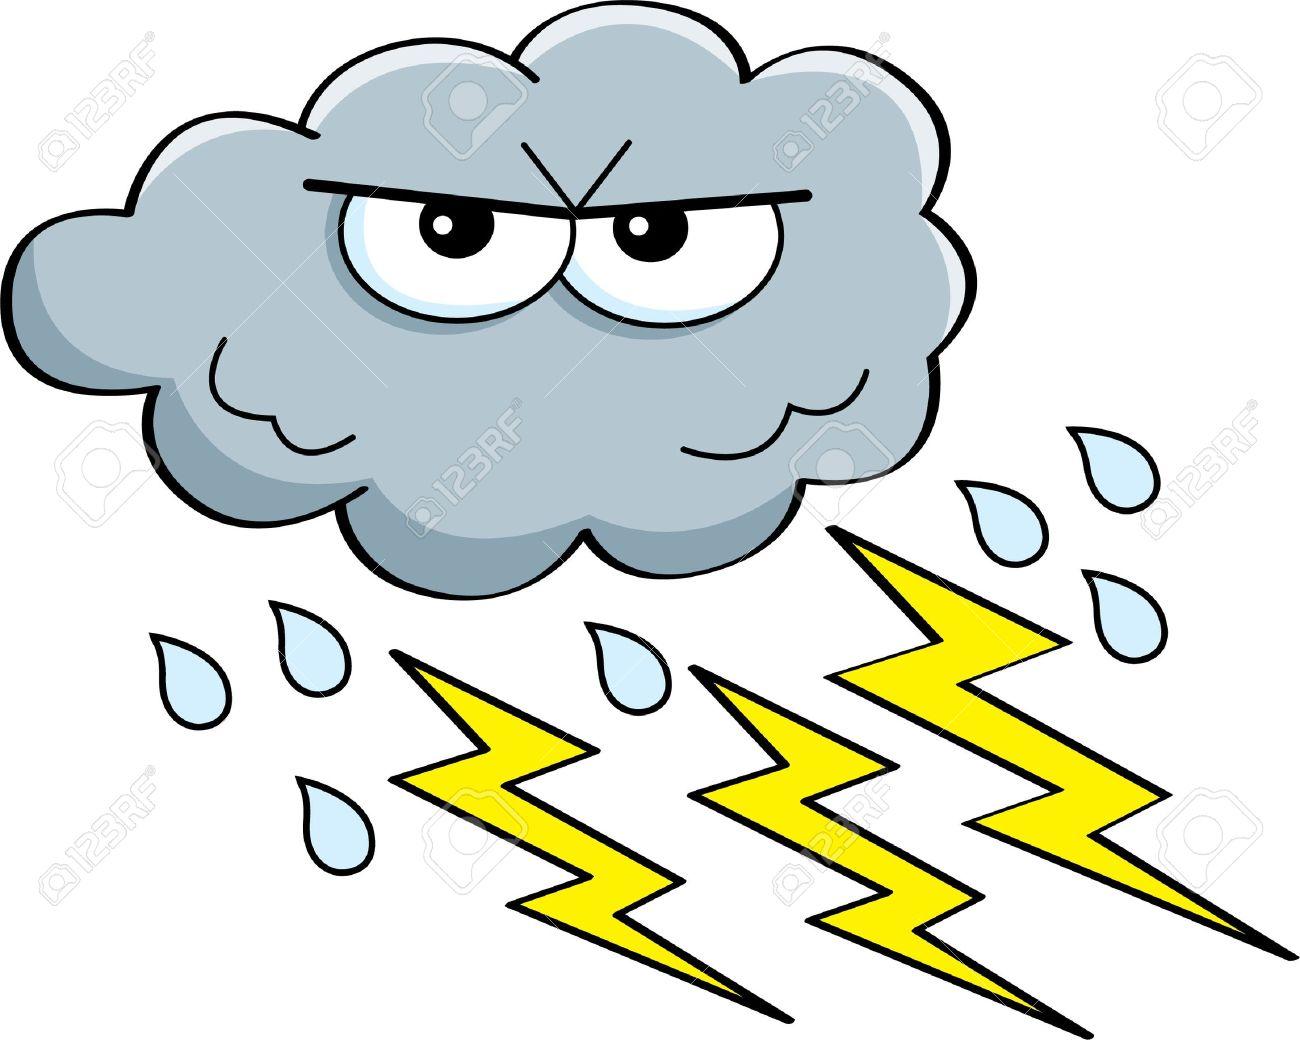 cartoon illustration of a storm cloud with rain and lightning rh 123rf com cartoon storm cloud with lightning cartoon character with storm cloud